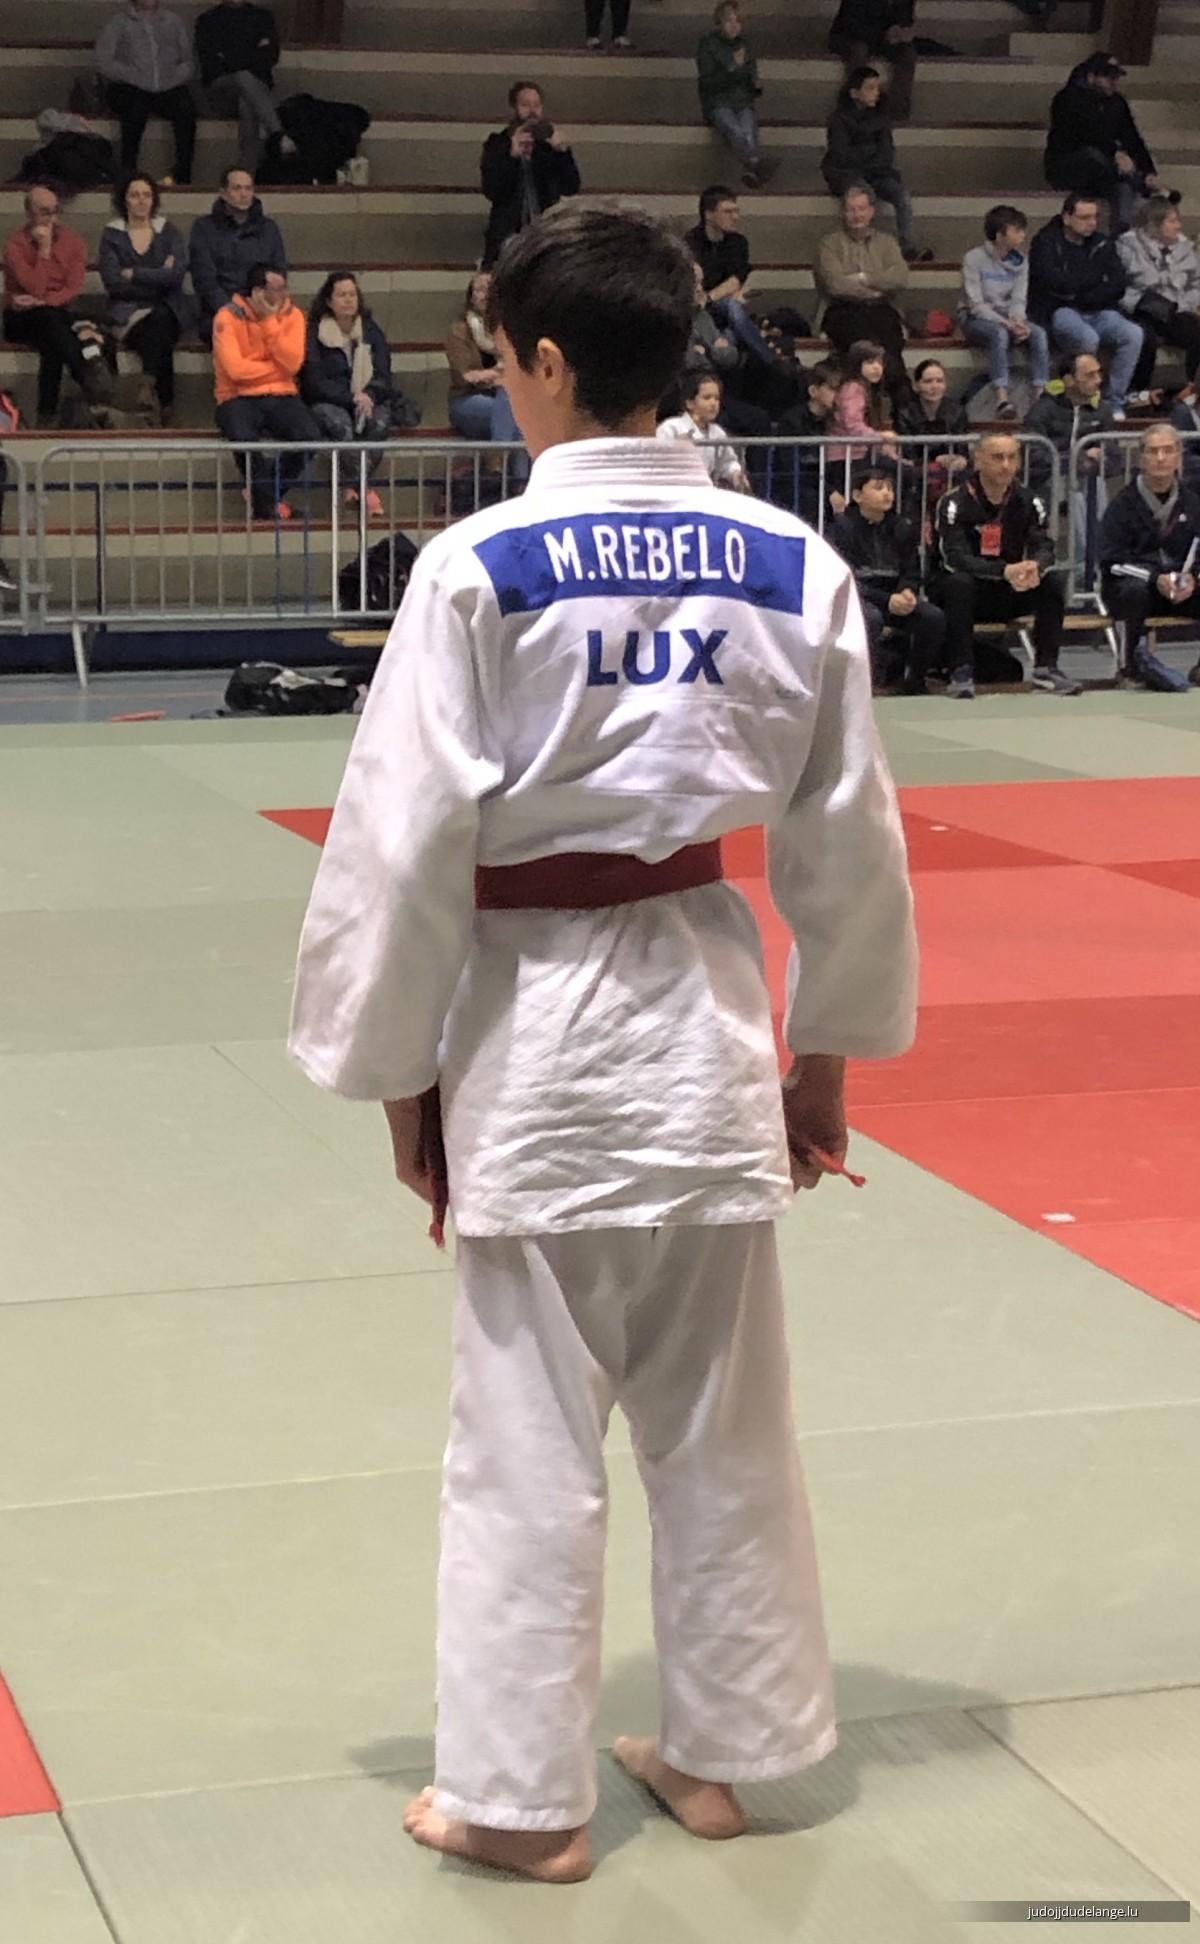 Tournoi 'Oscar Puttaert' à Arlon le 30.11.2019